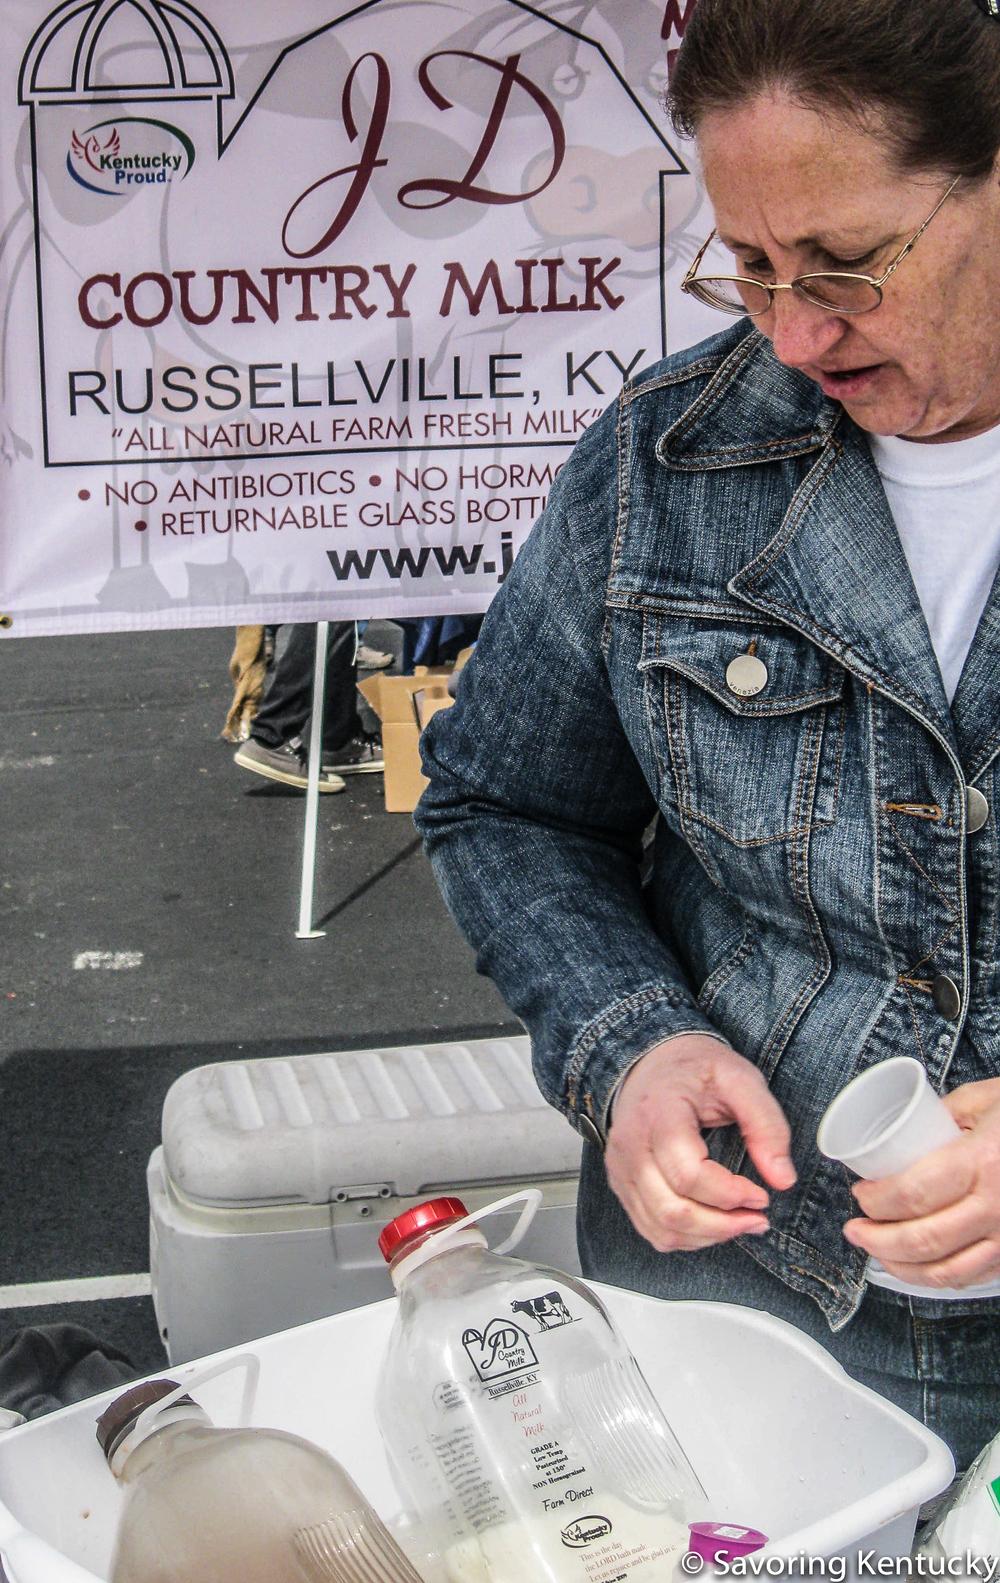 JD Country Milk at the Kentucky Green Living Fair, 2014